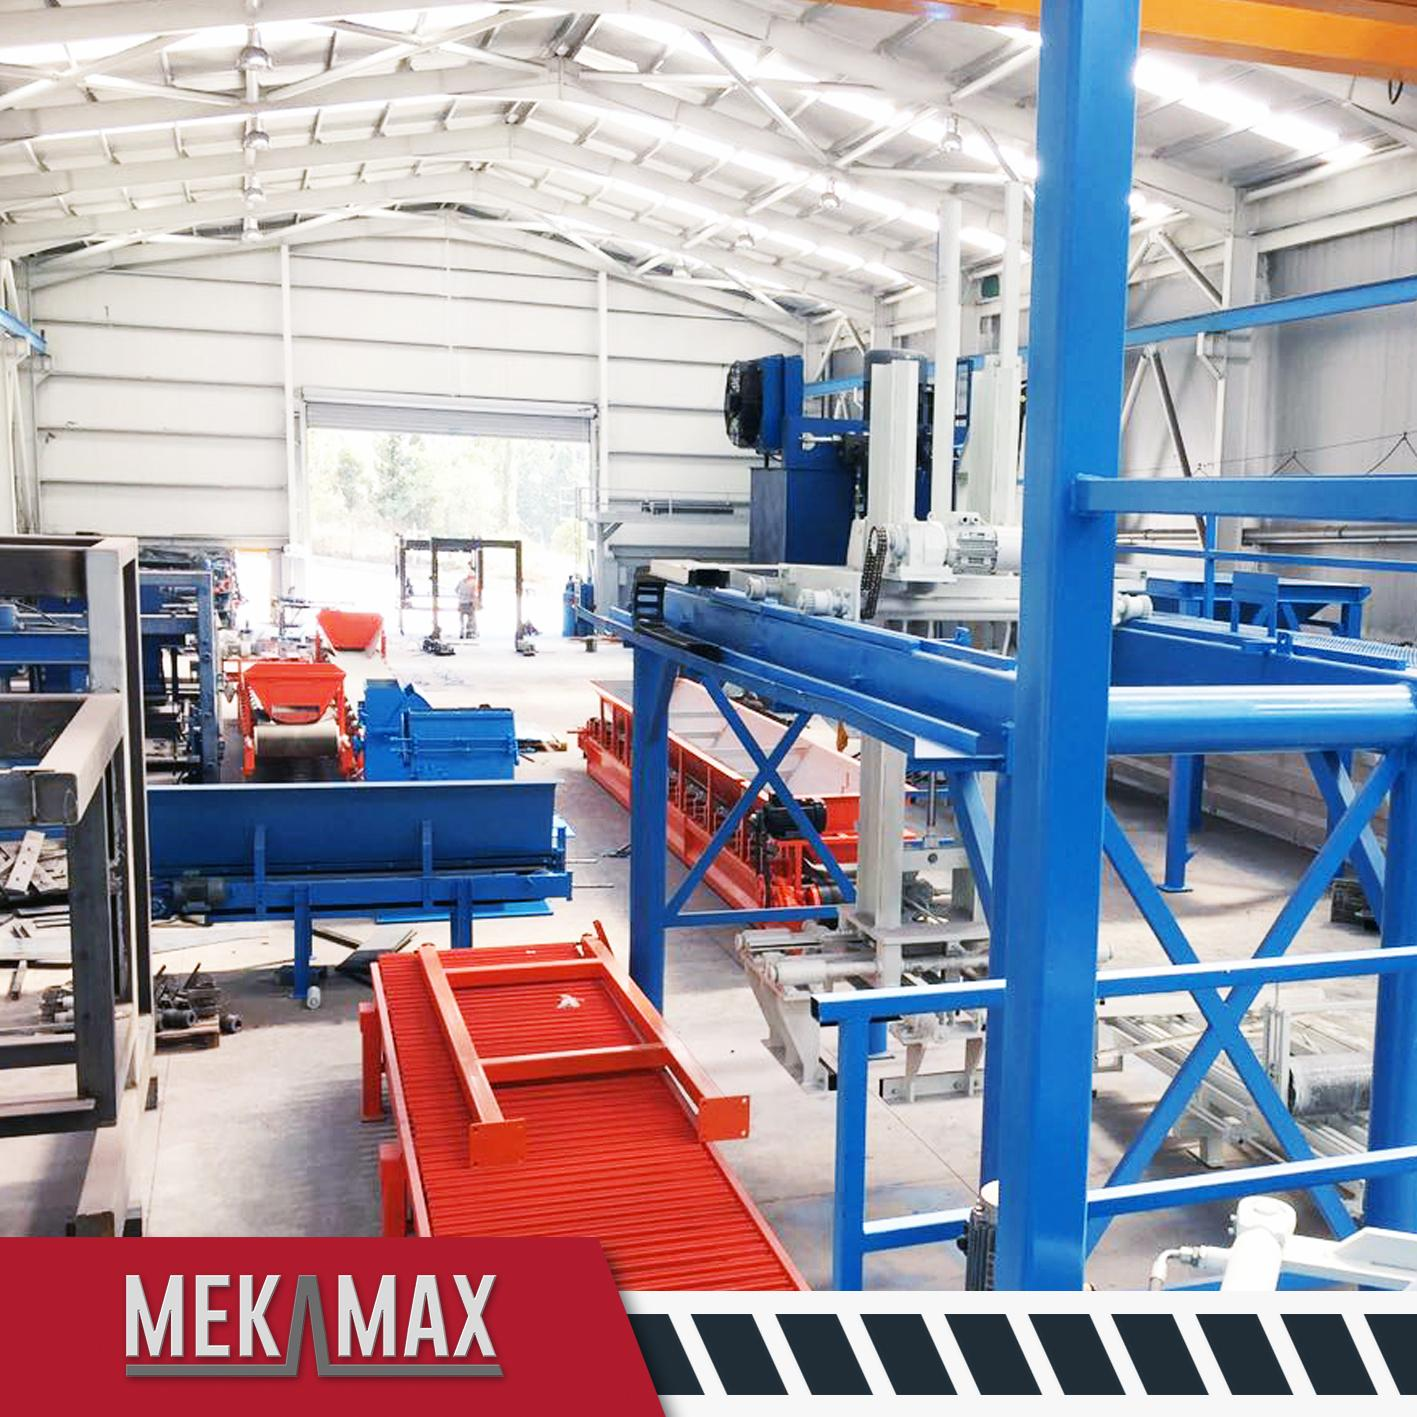 MEKAMAX OPTIMUS CONCRETE BLOCK MACHINE PRODUCTION